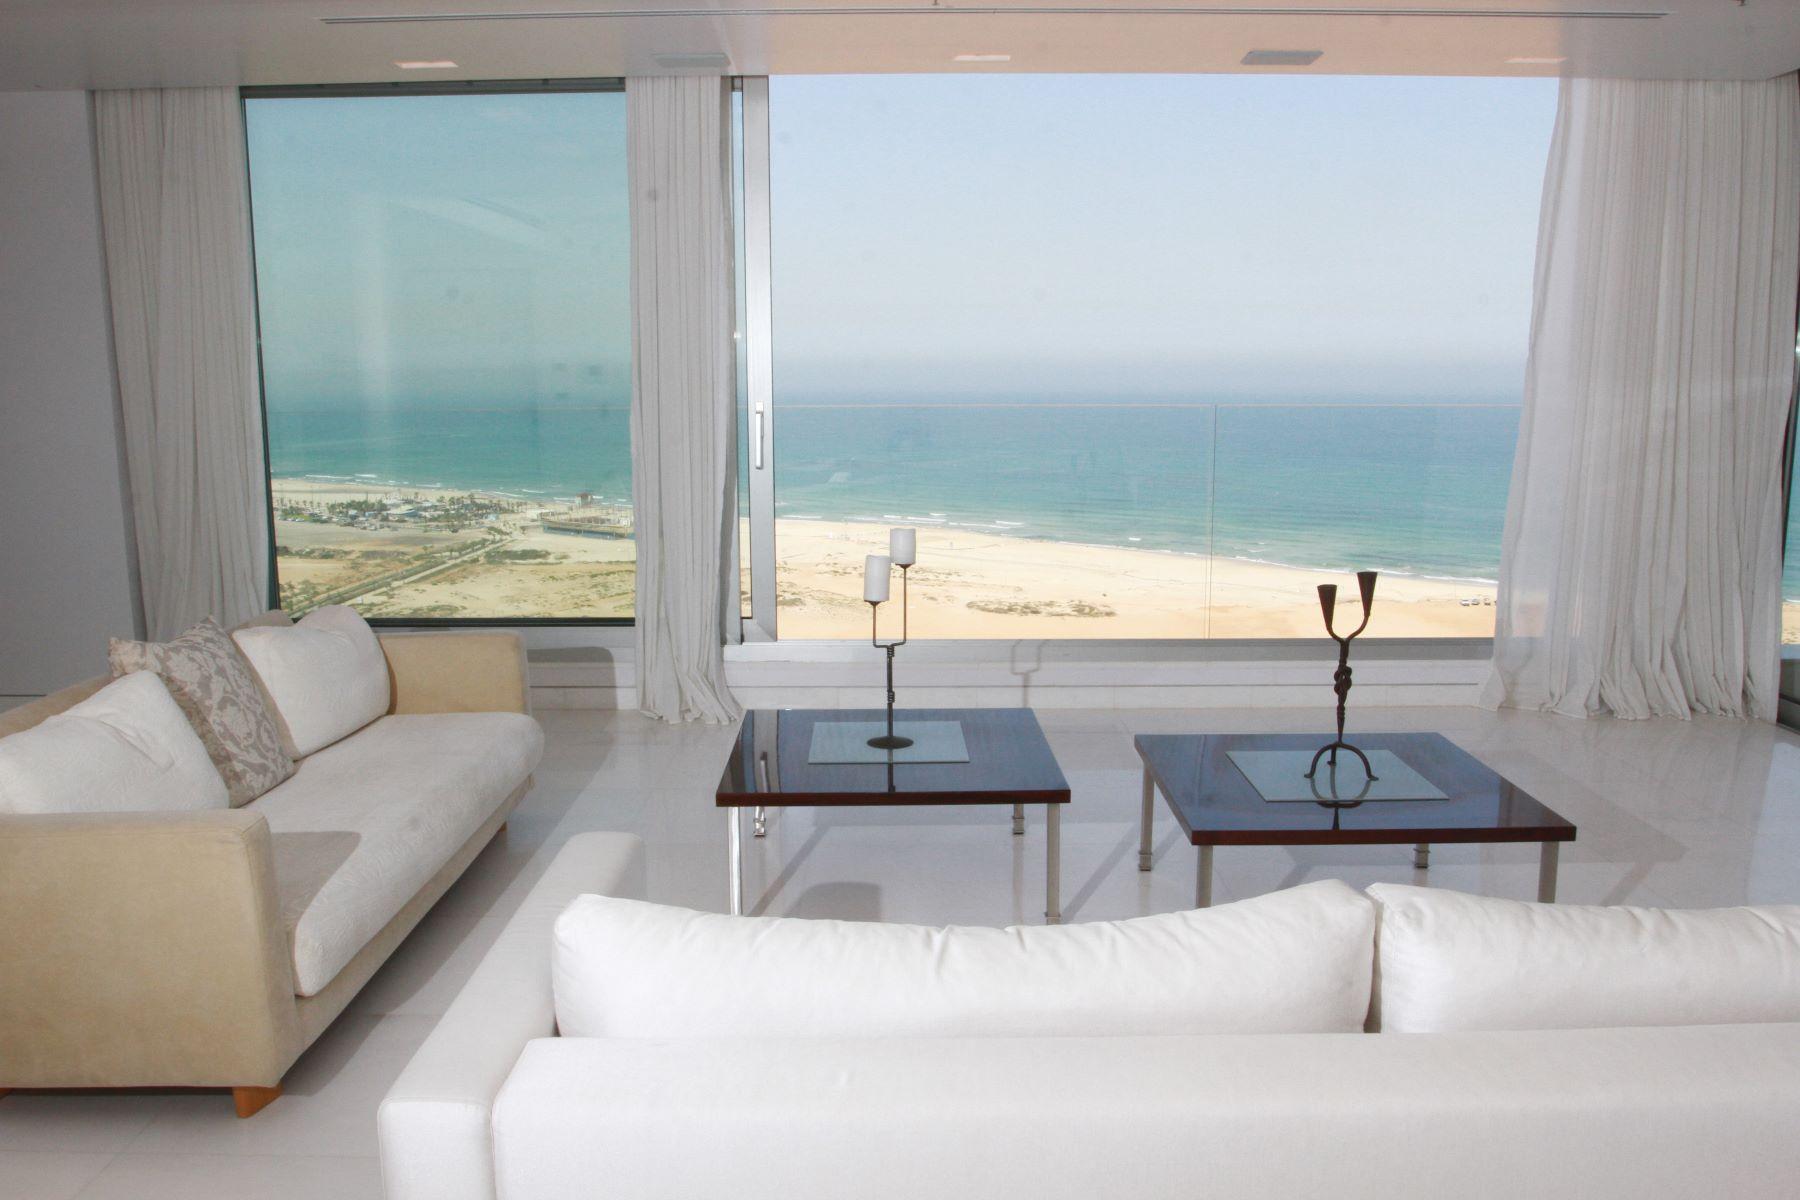 Additional photo for property listing at 360 degrees Sea view apartment in Netanya  Netanya, Israel 426950 Israël